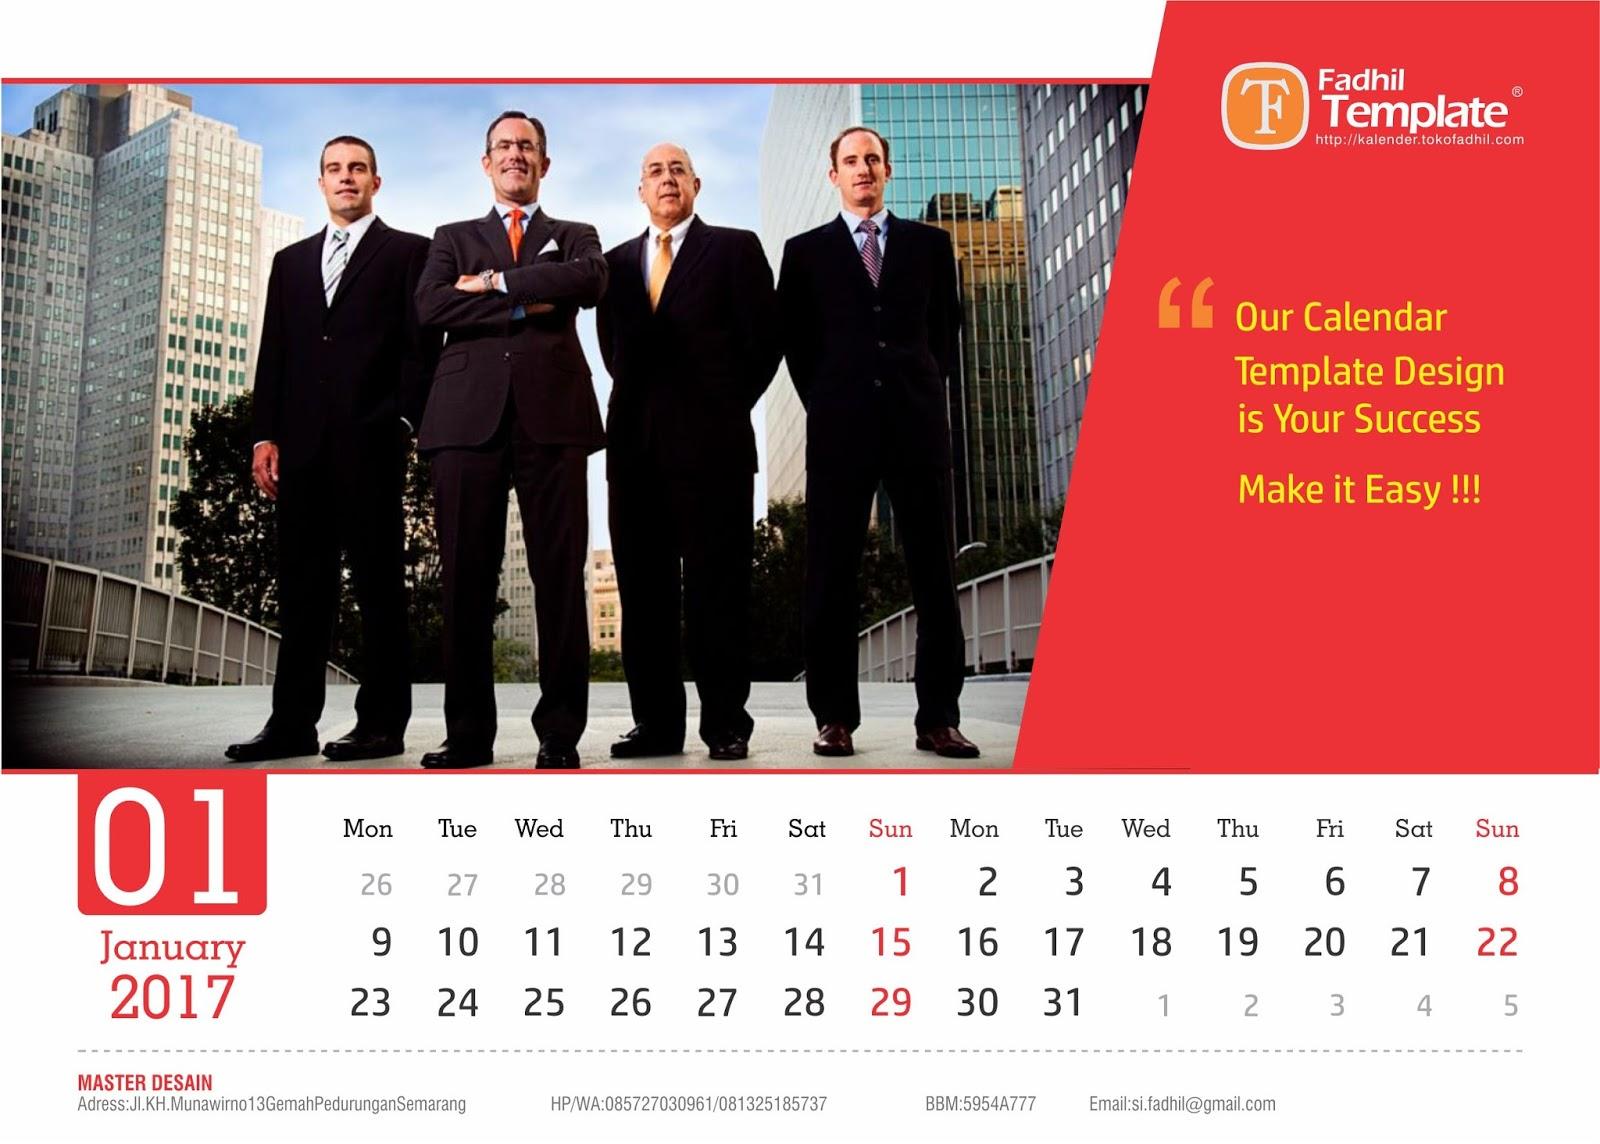 Cool calendar templates saigontimesfo